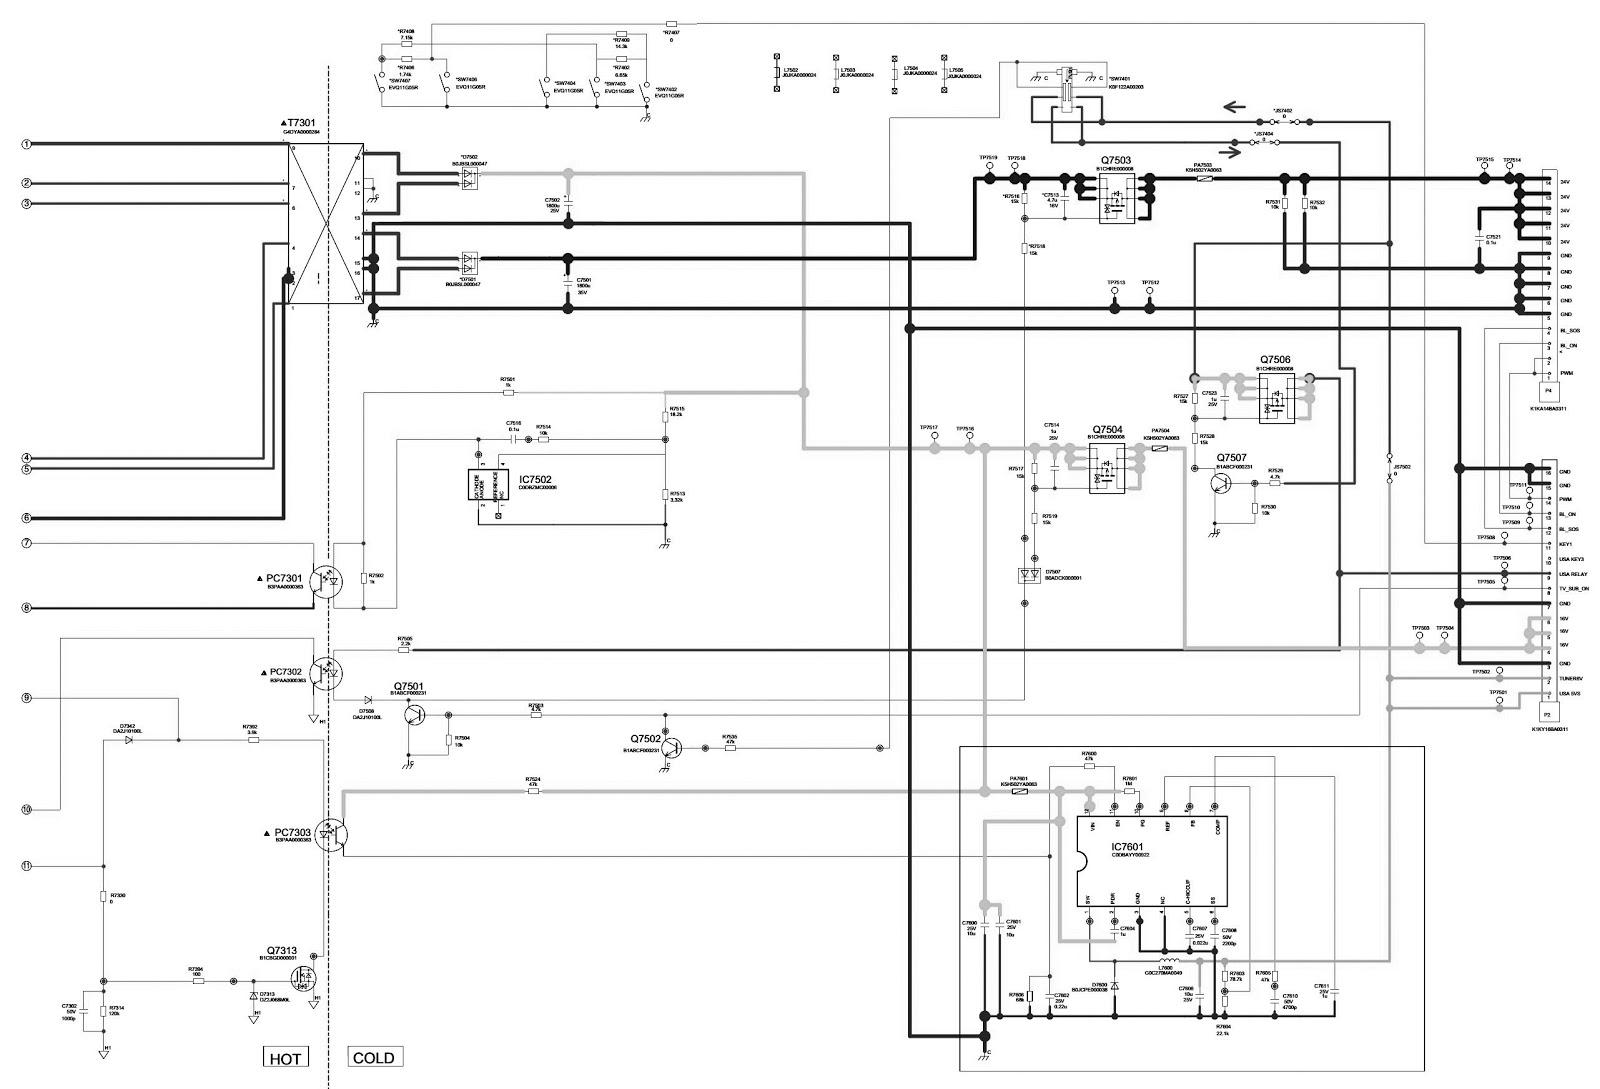 hdmi wiring schematic diagram panasonic schematic diagram